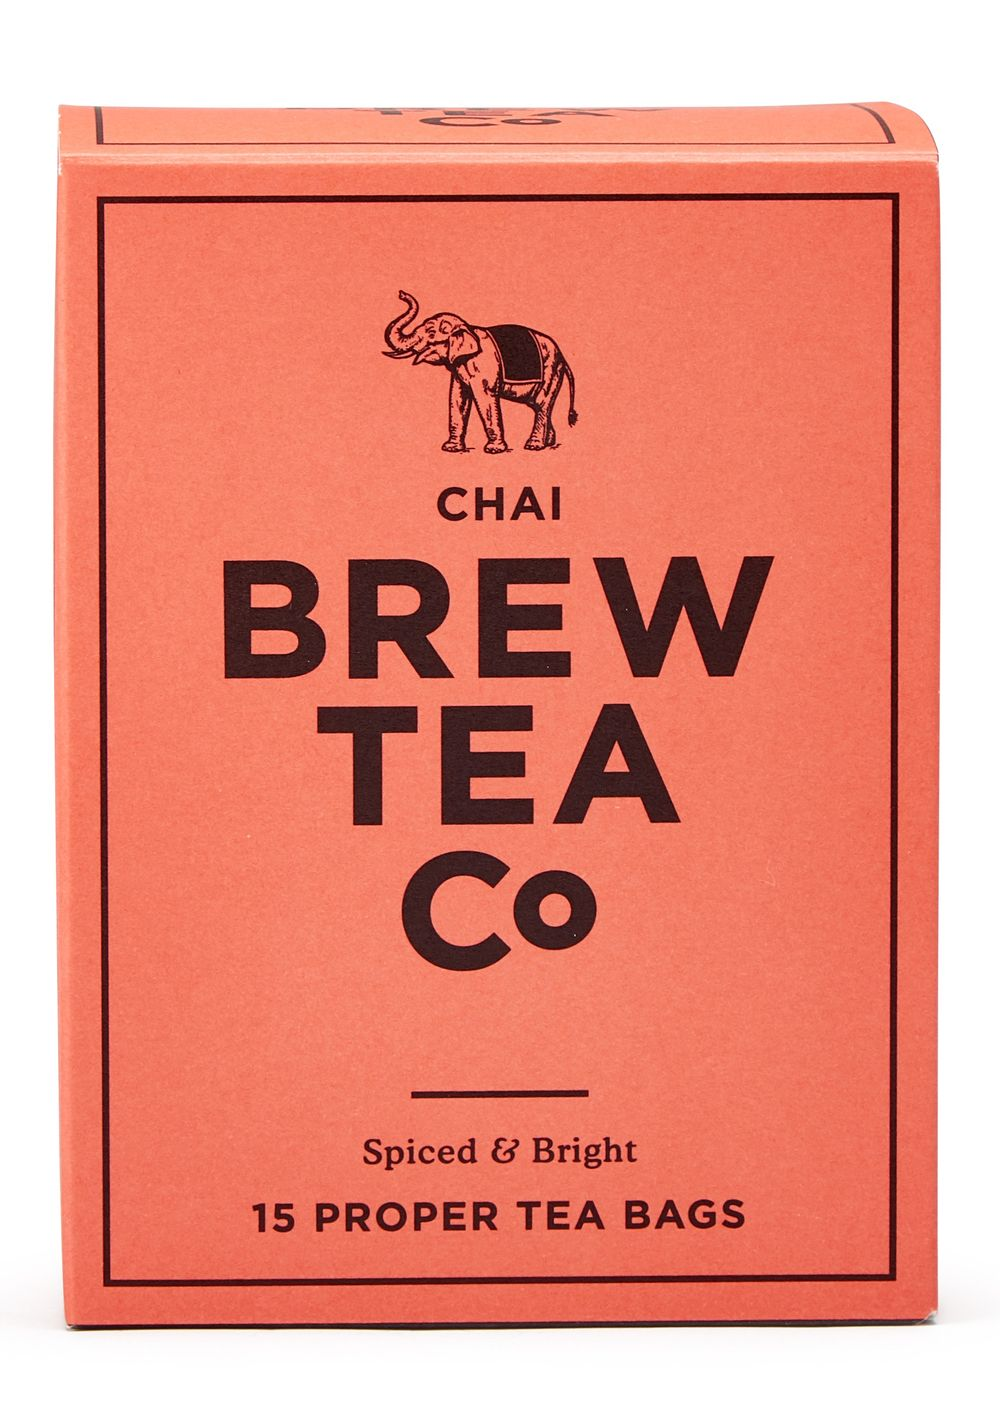 Chai Tea - 15 Proper Tea Bags